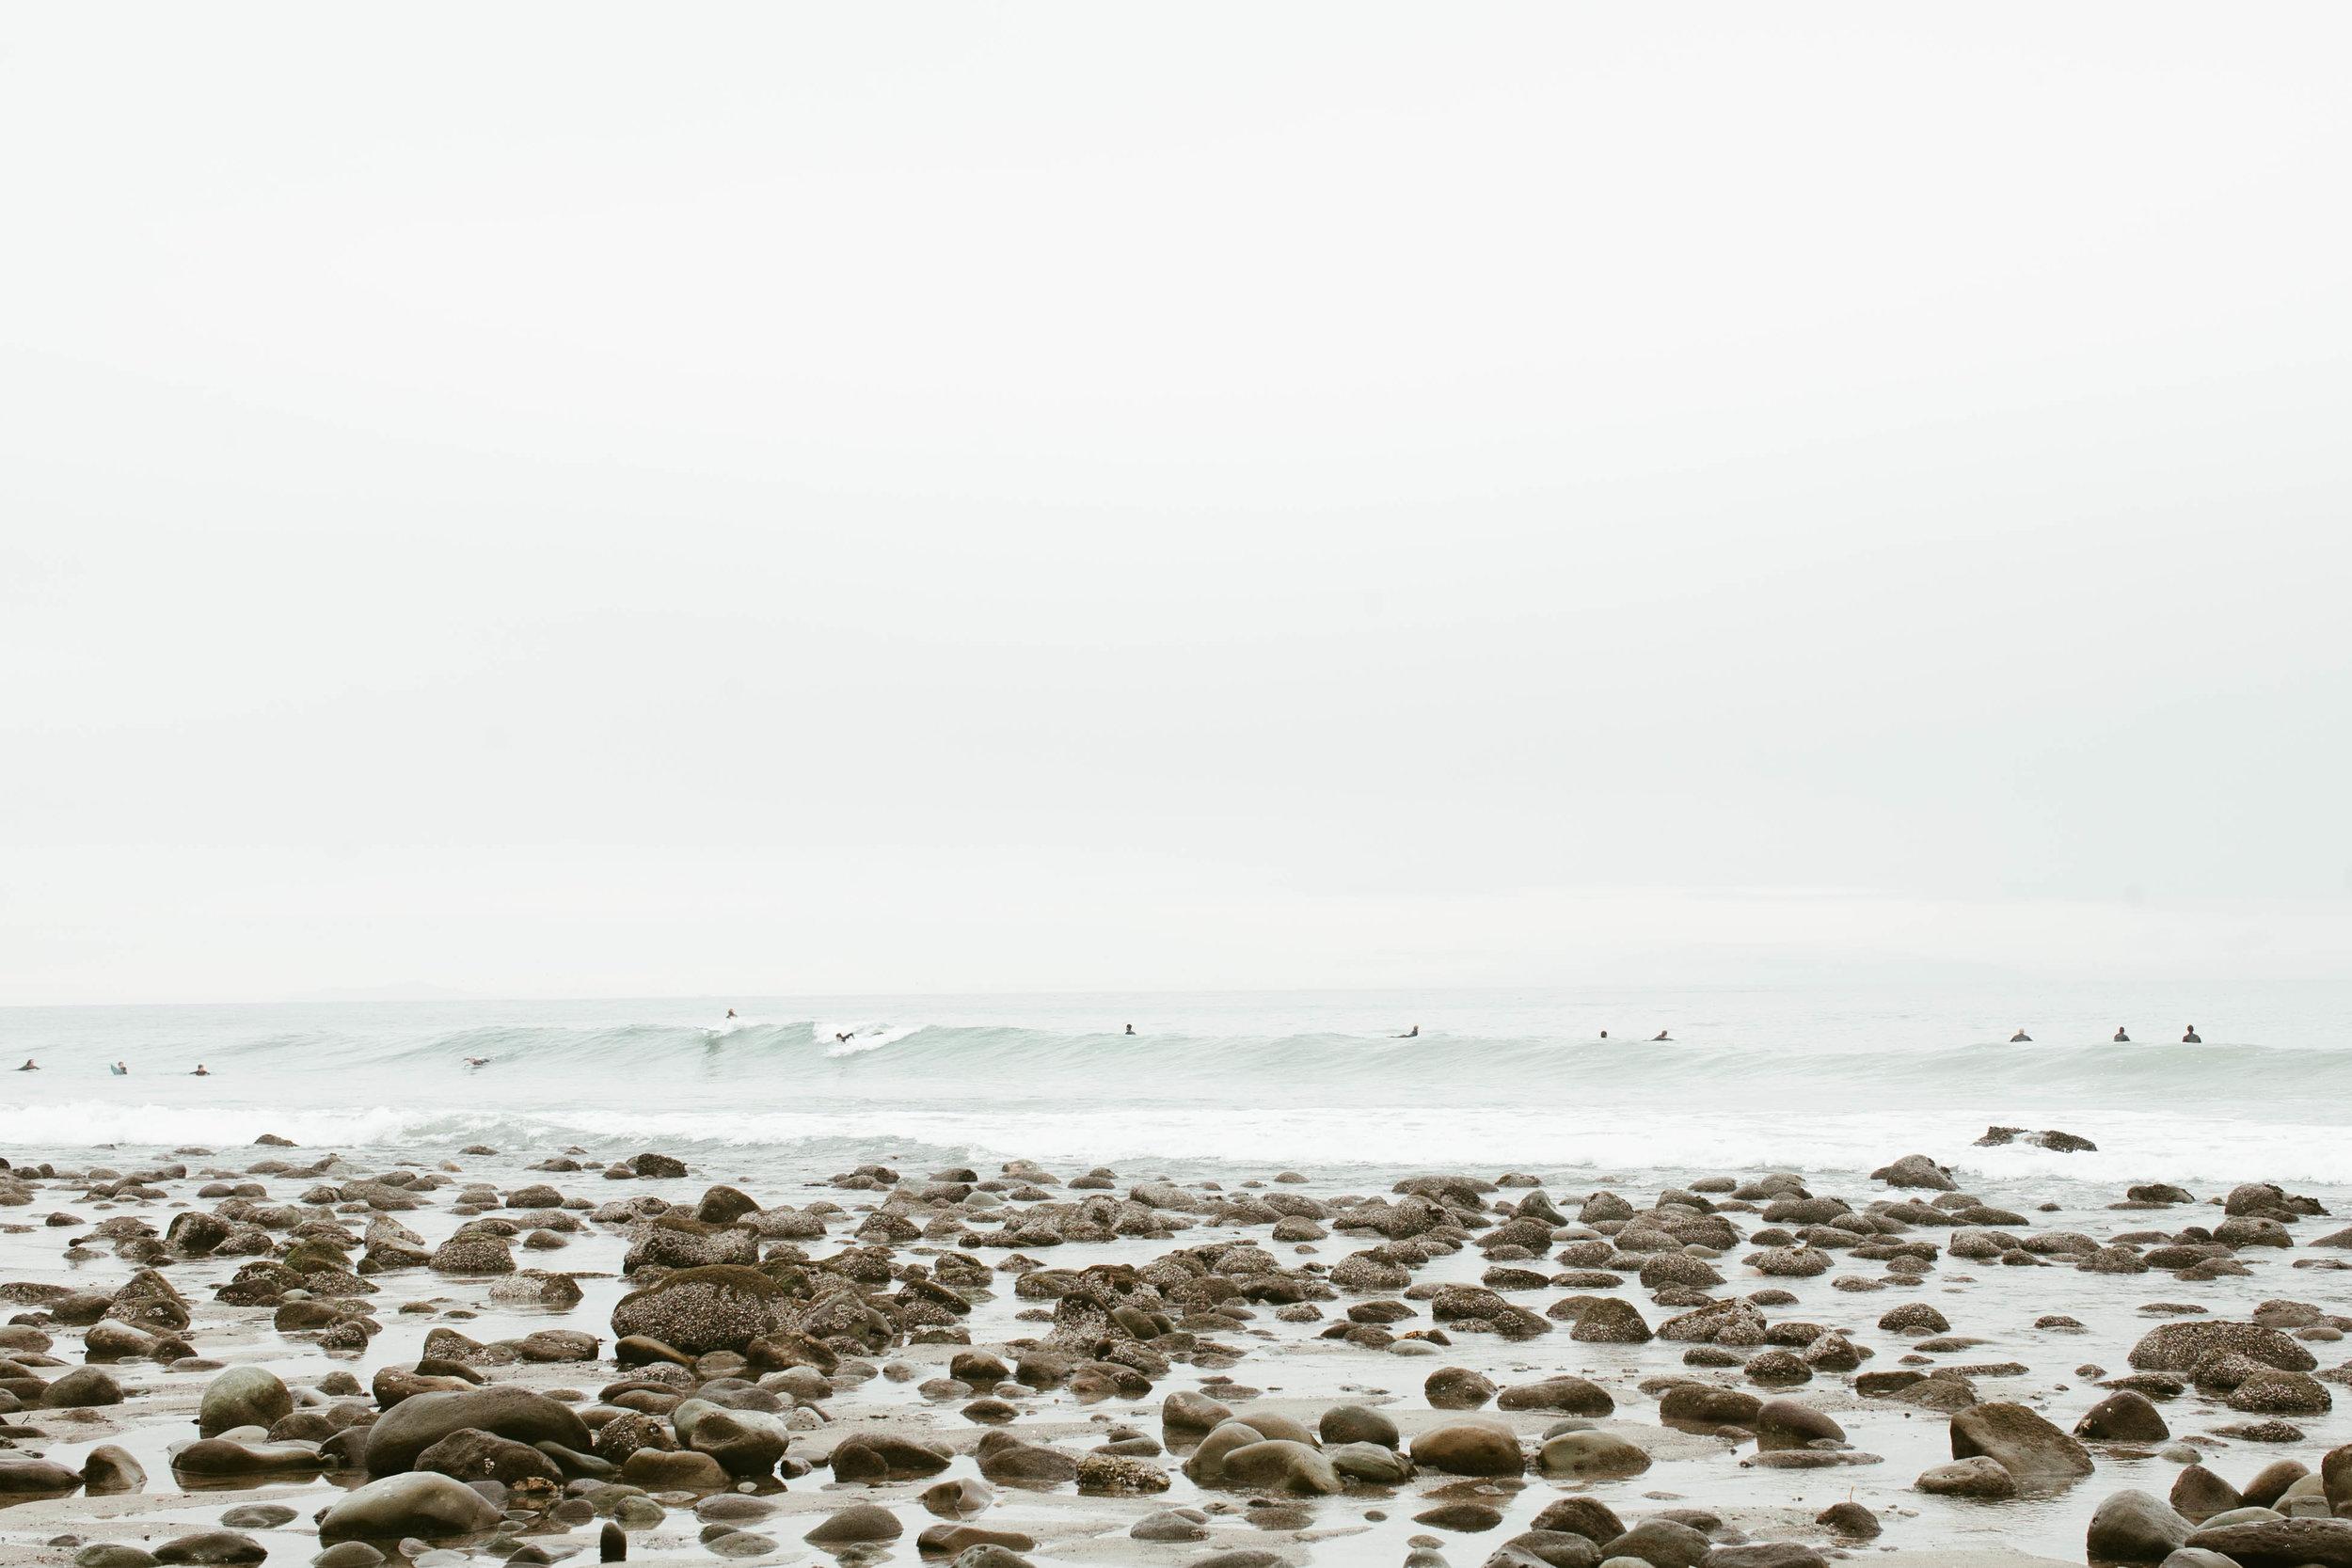 jennahazelphotography-updated-portfolio-4461.jpg